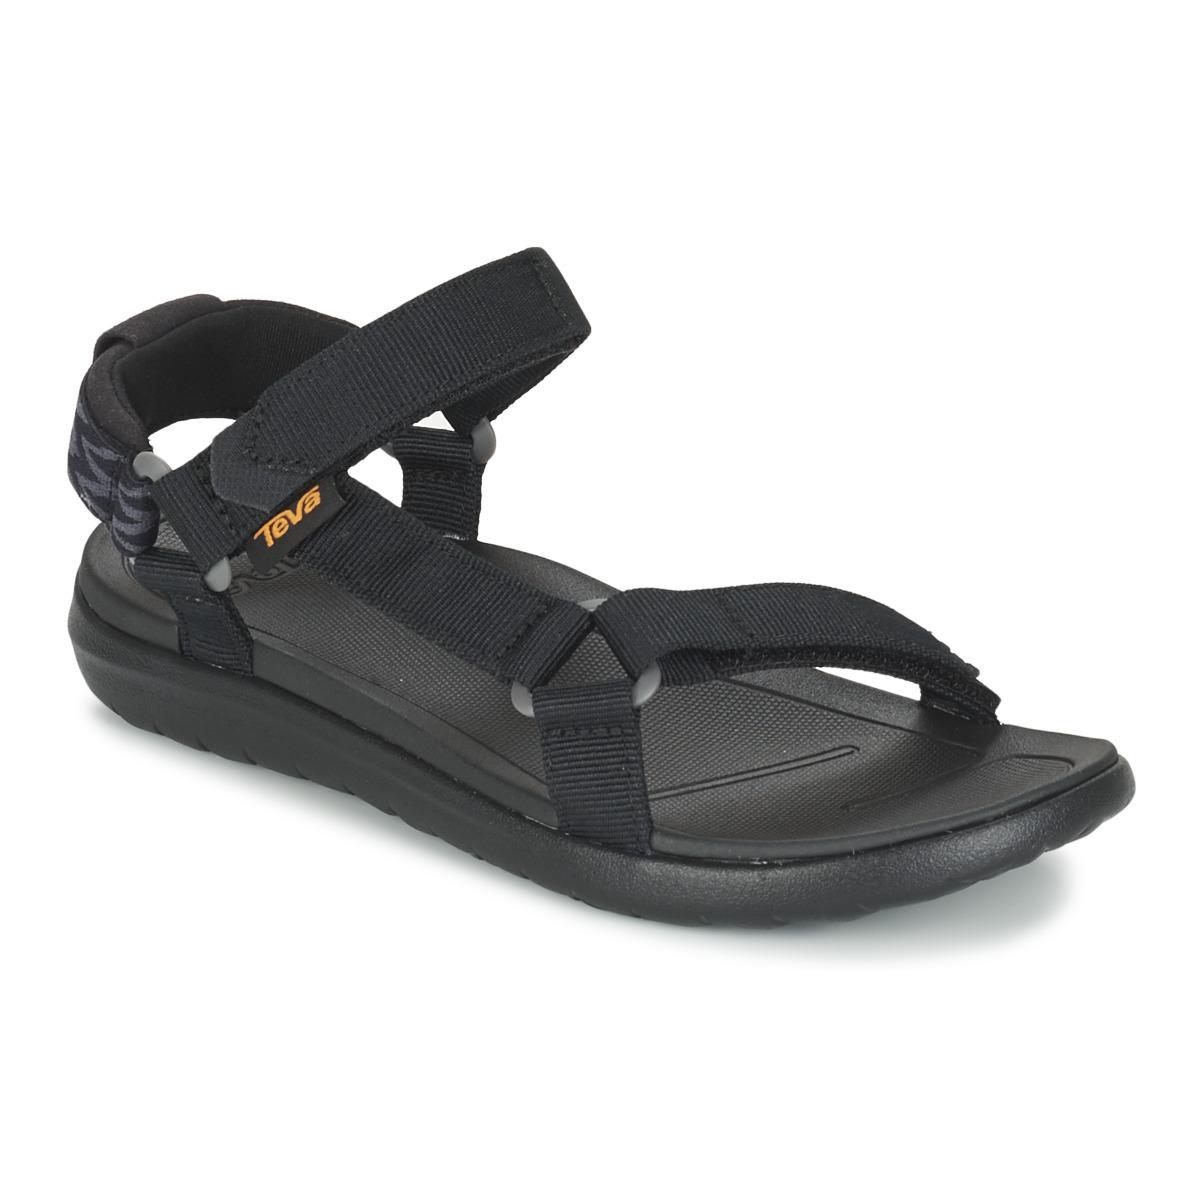 56ce2503d Teva Sanborn Universal Women s Sandals In Black in Black - Lyst